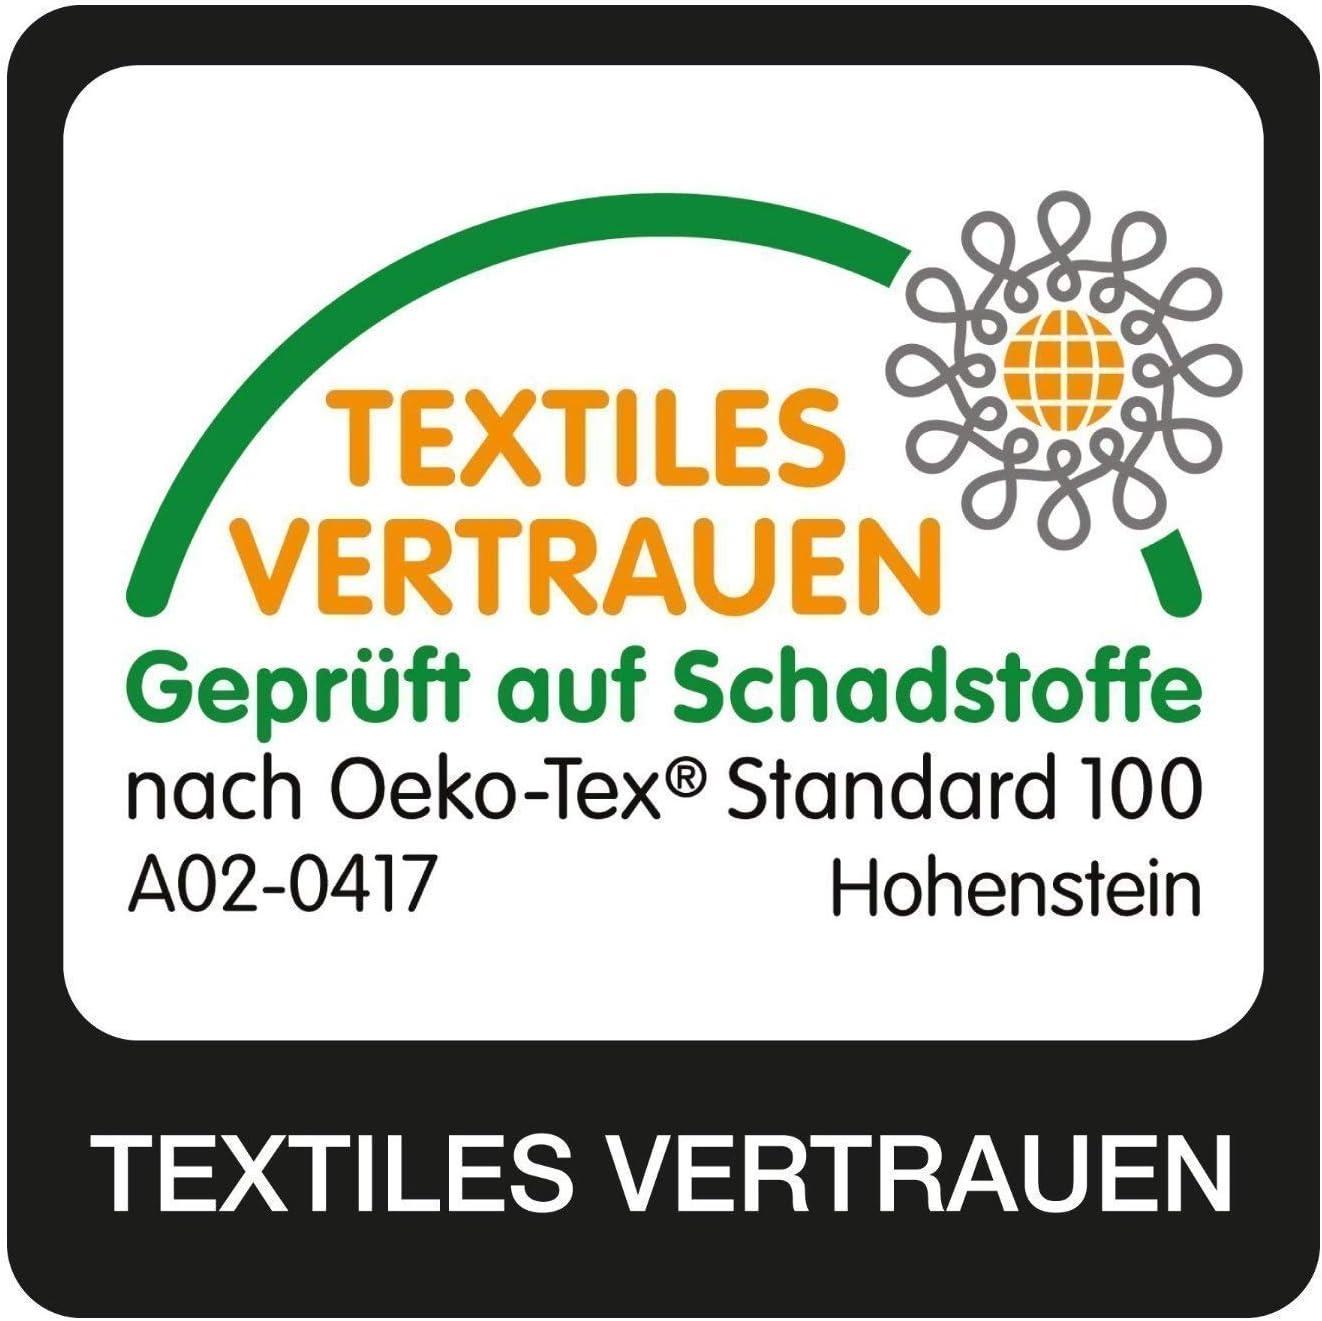 Schlafmond Aloe Vera Cosimo Frottee Bezug 40 x 140 cm f/ür Seitenschl/äferkissen